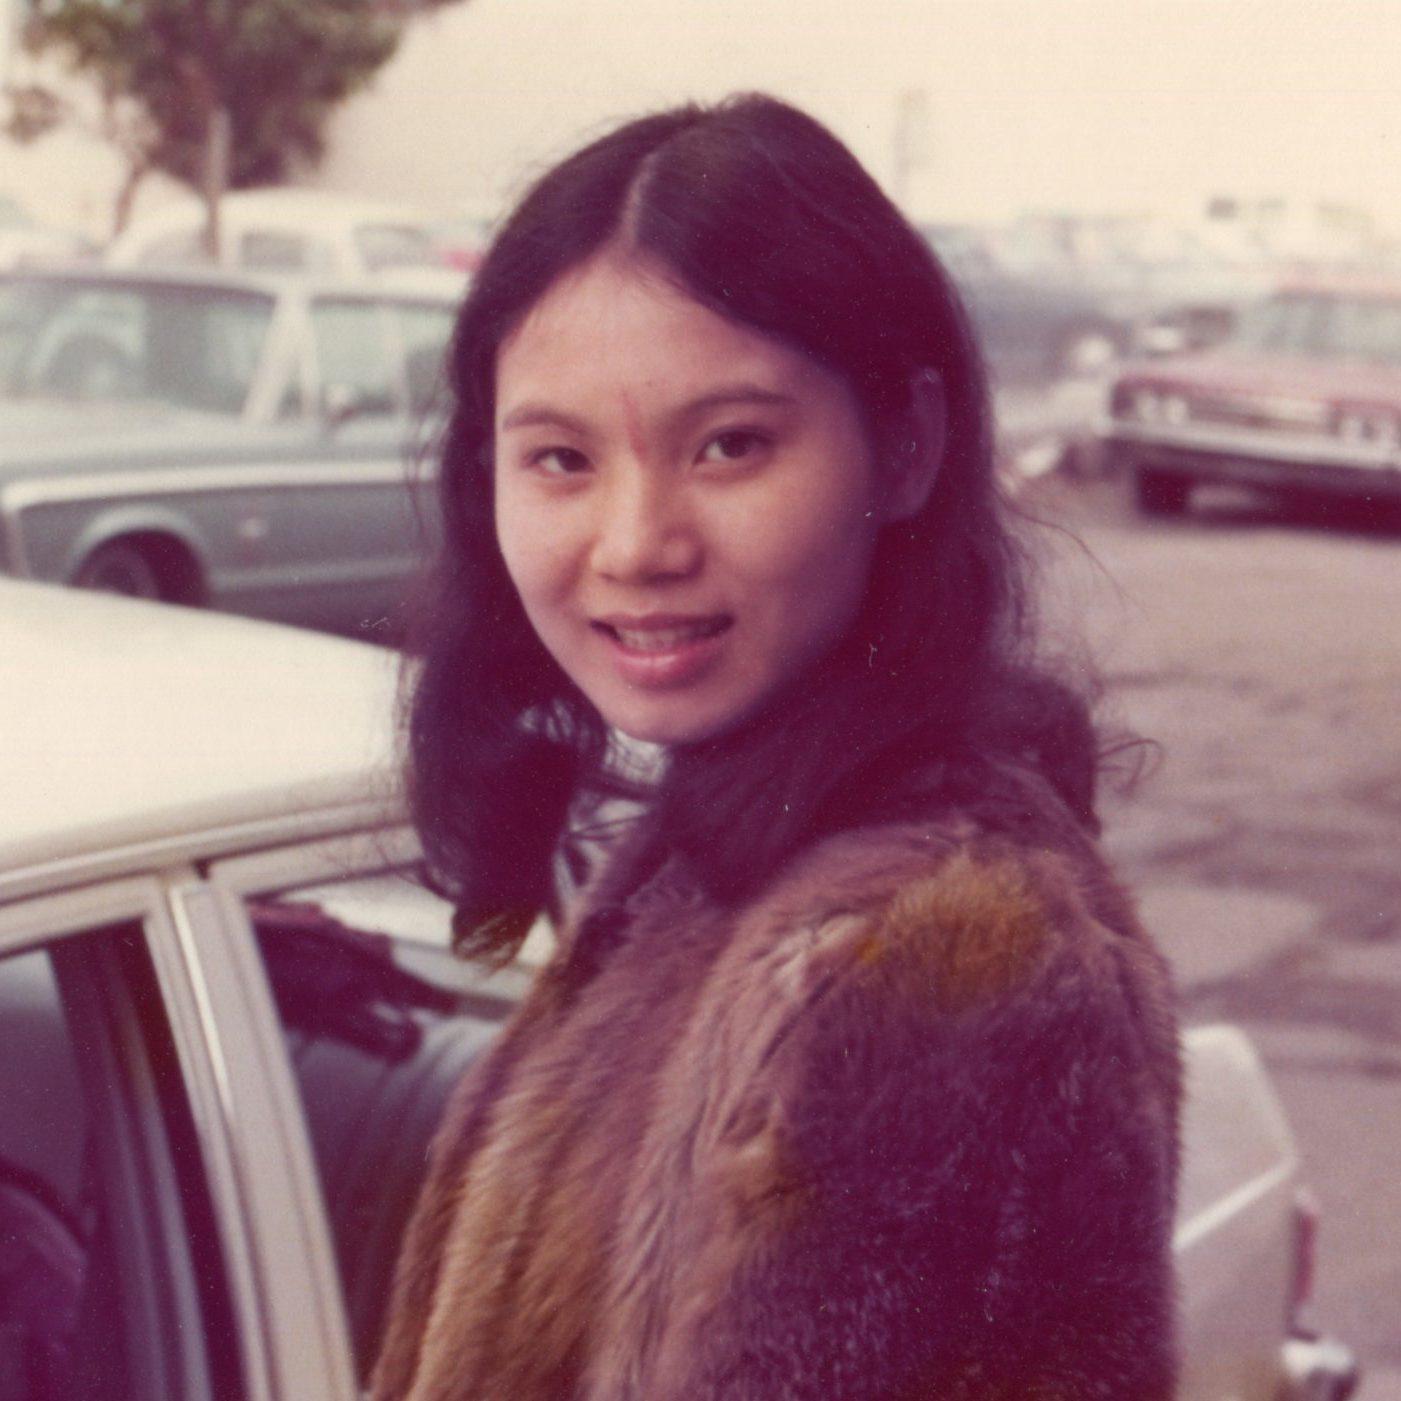 Thanh Sebastian